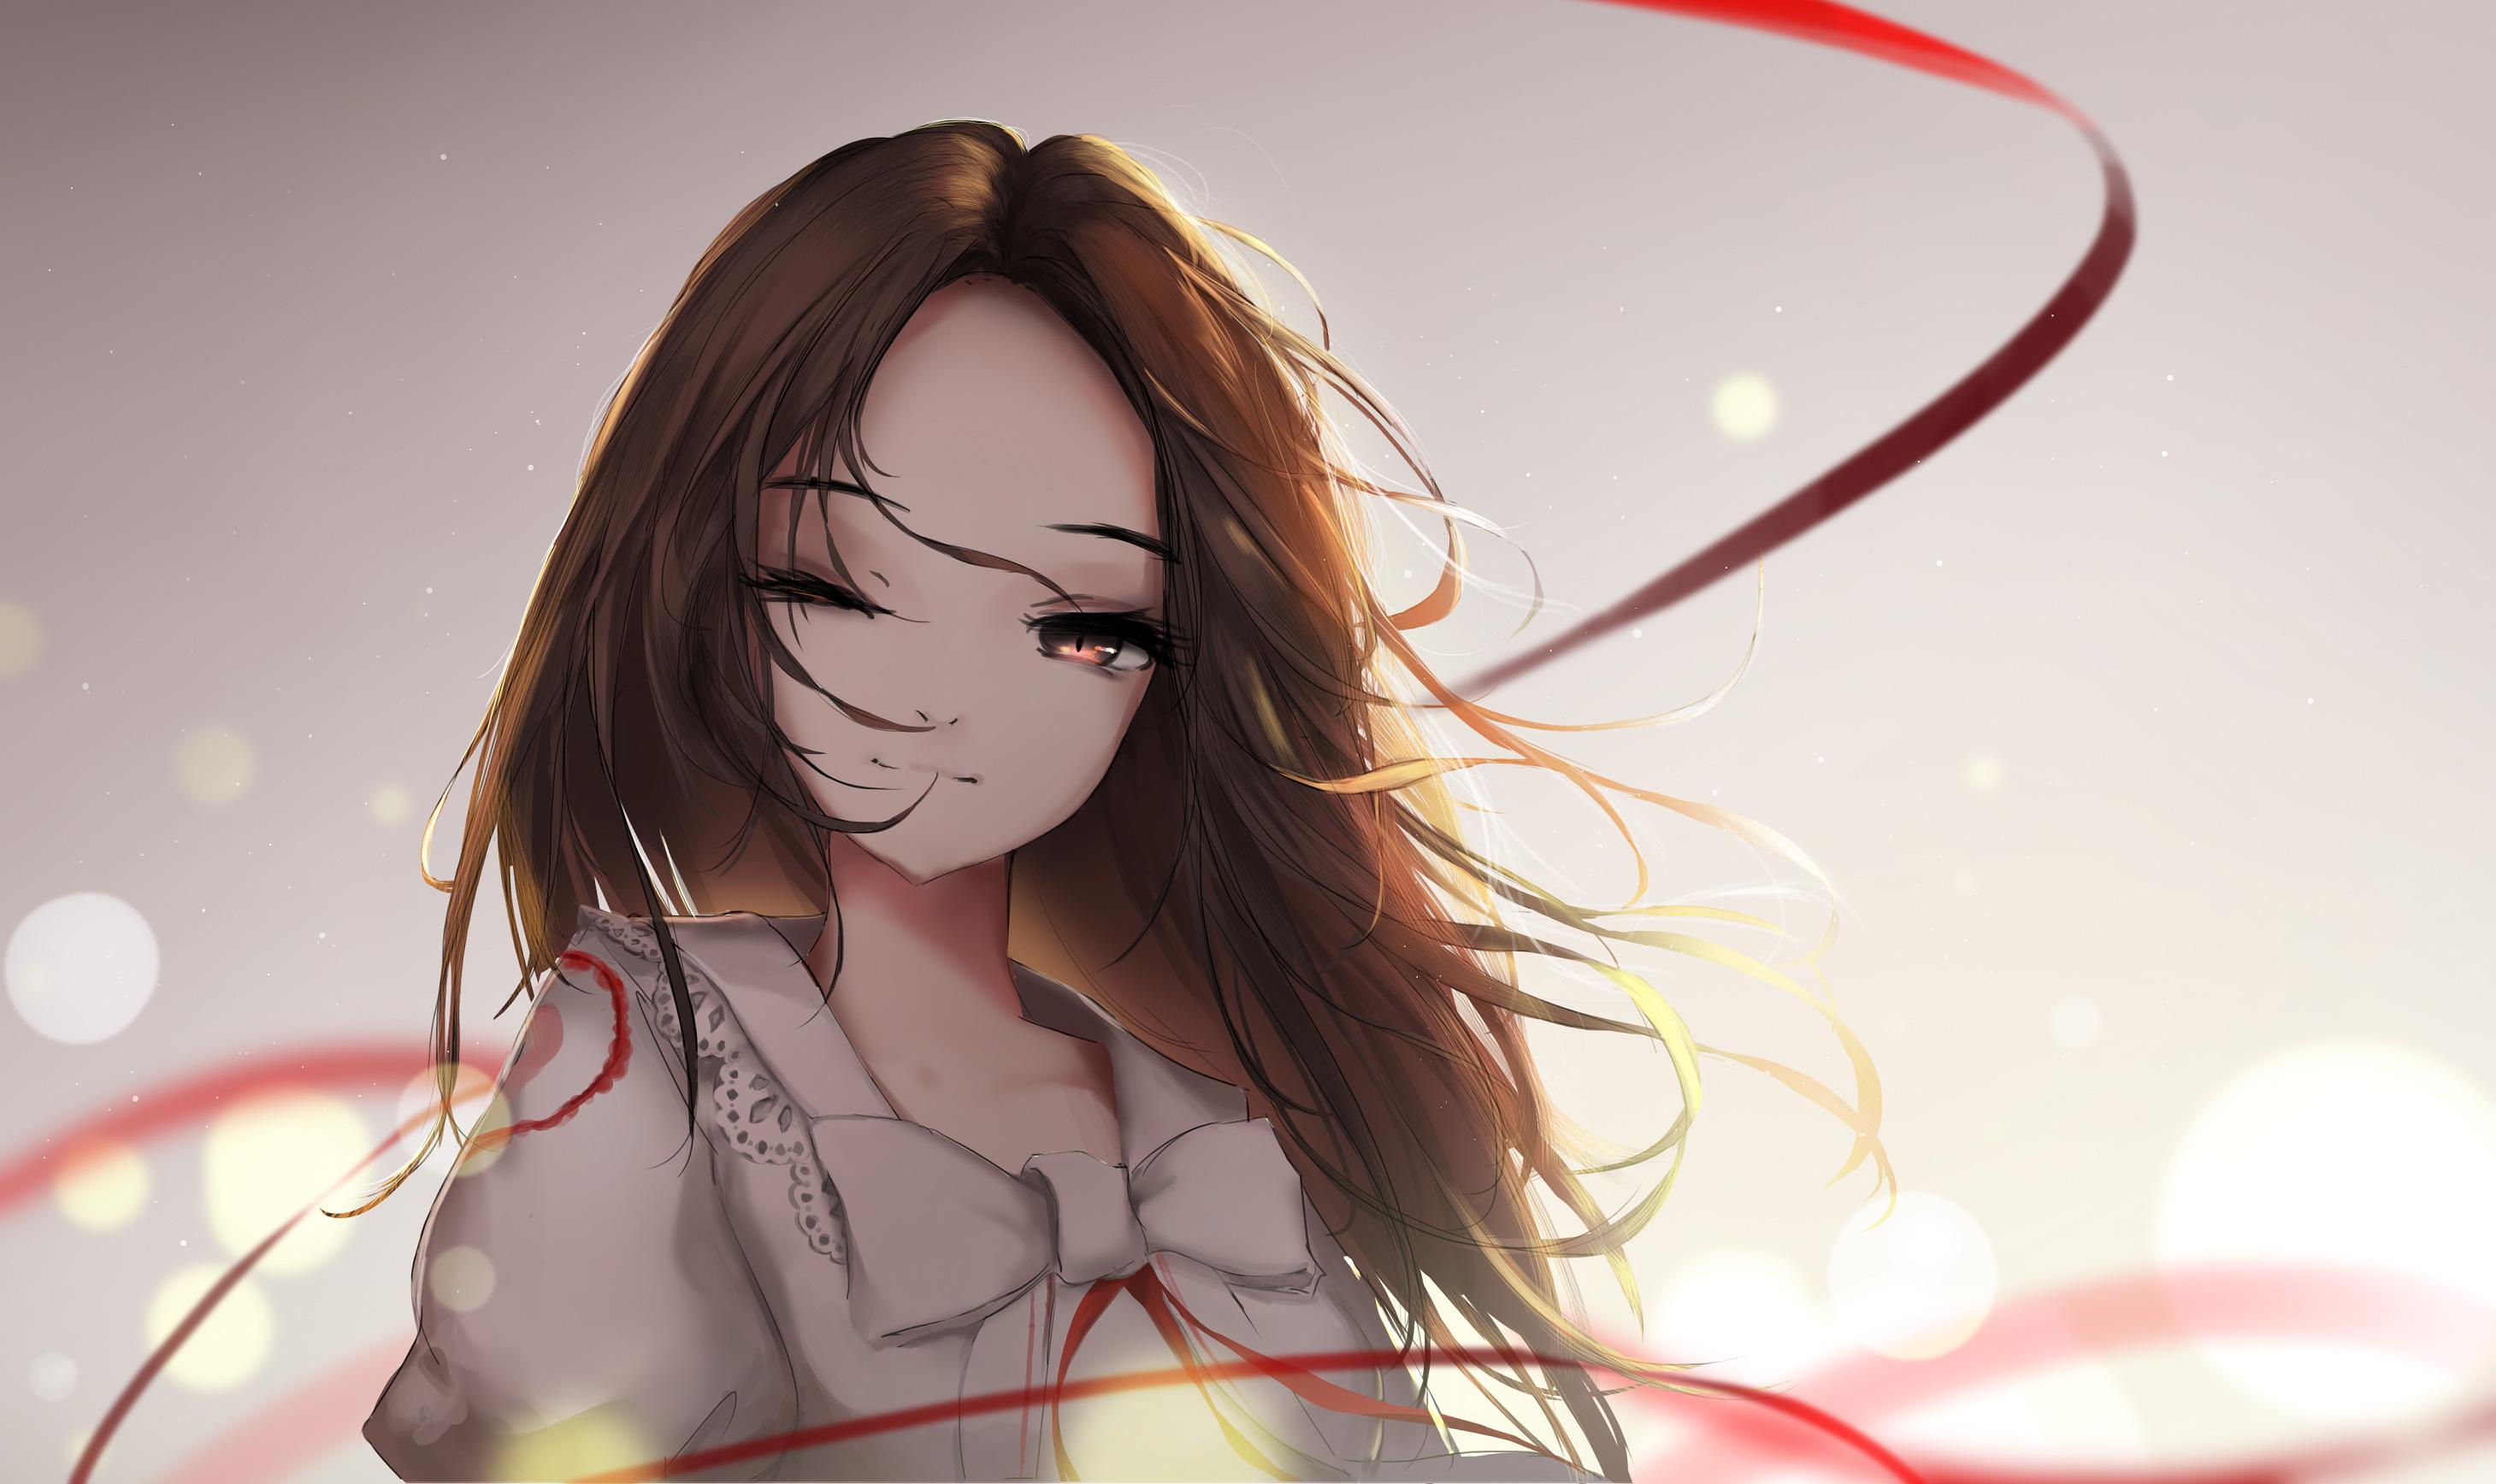 Brown long hair anime girl